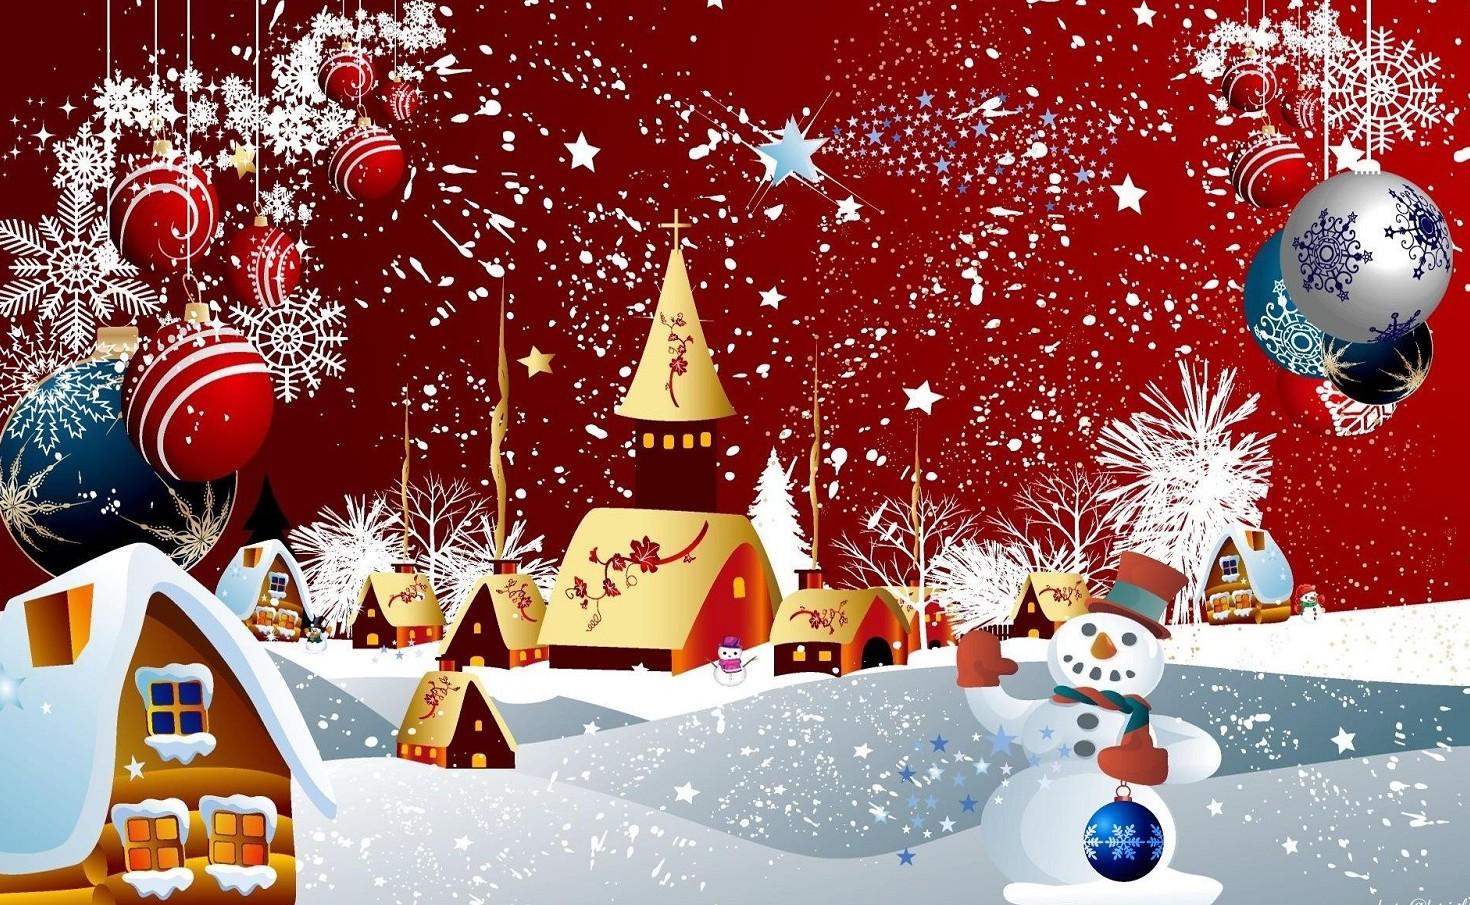 Frasi Auguri di Natale e Buone Feste 10